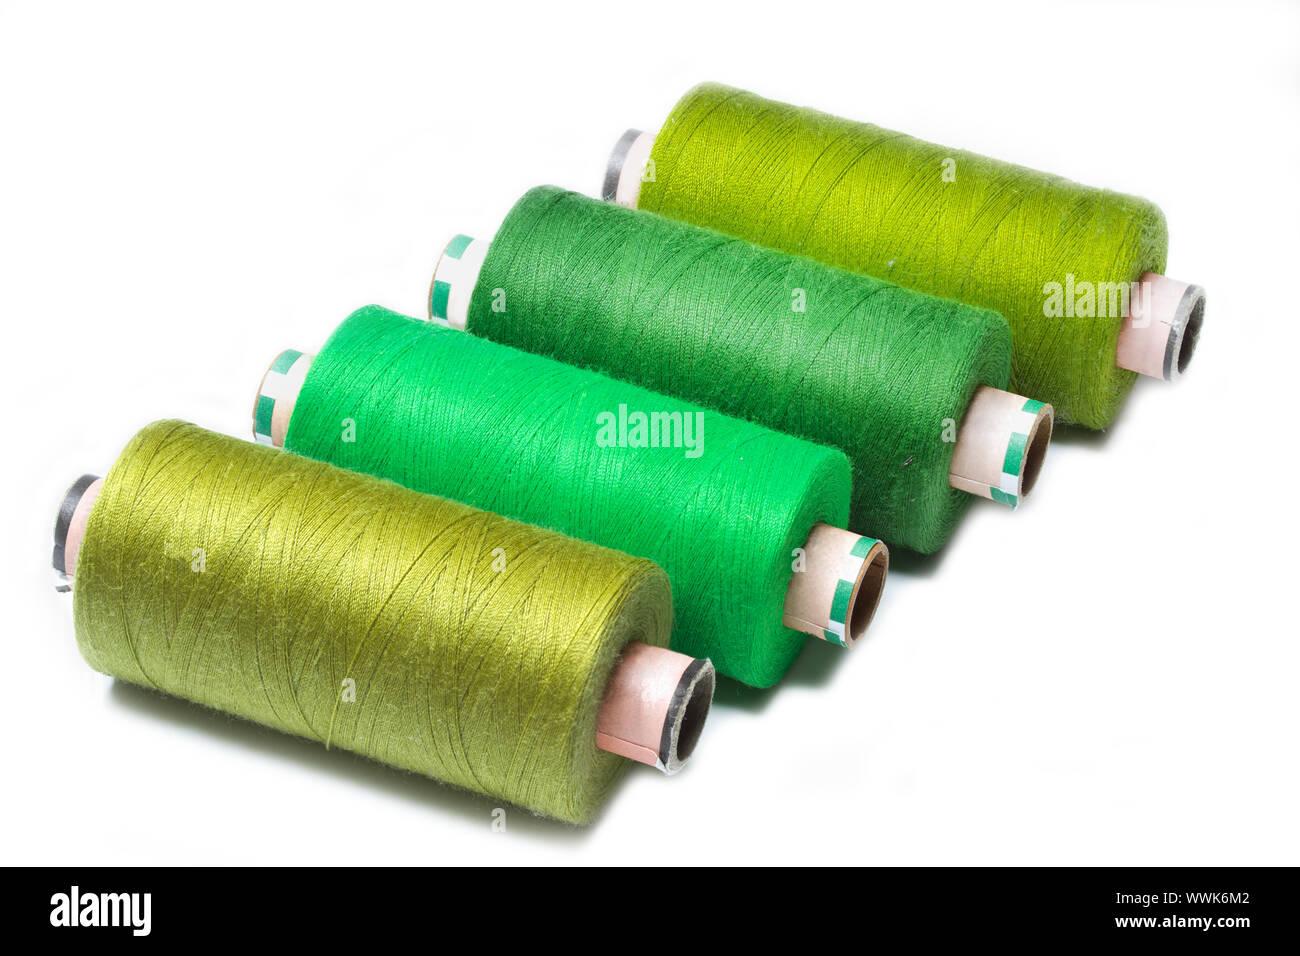 Coloured yarn reels Stock Photo